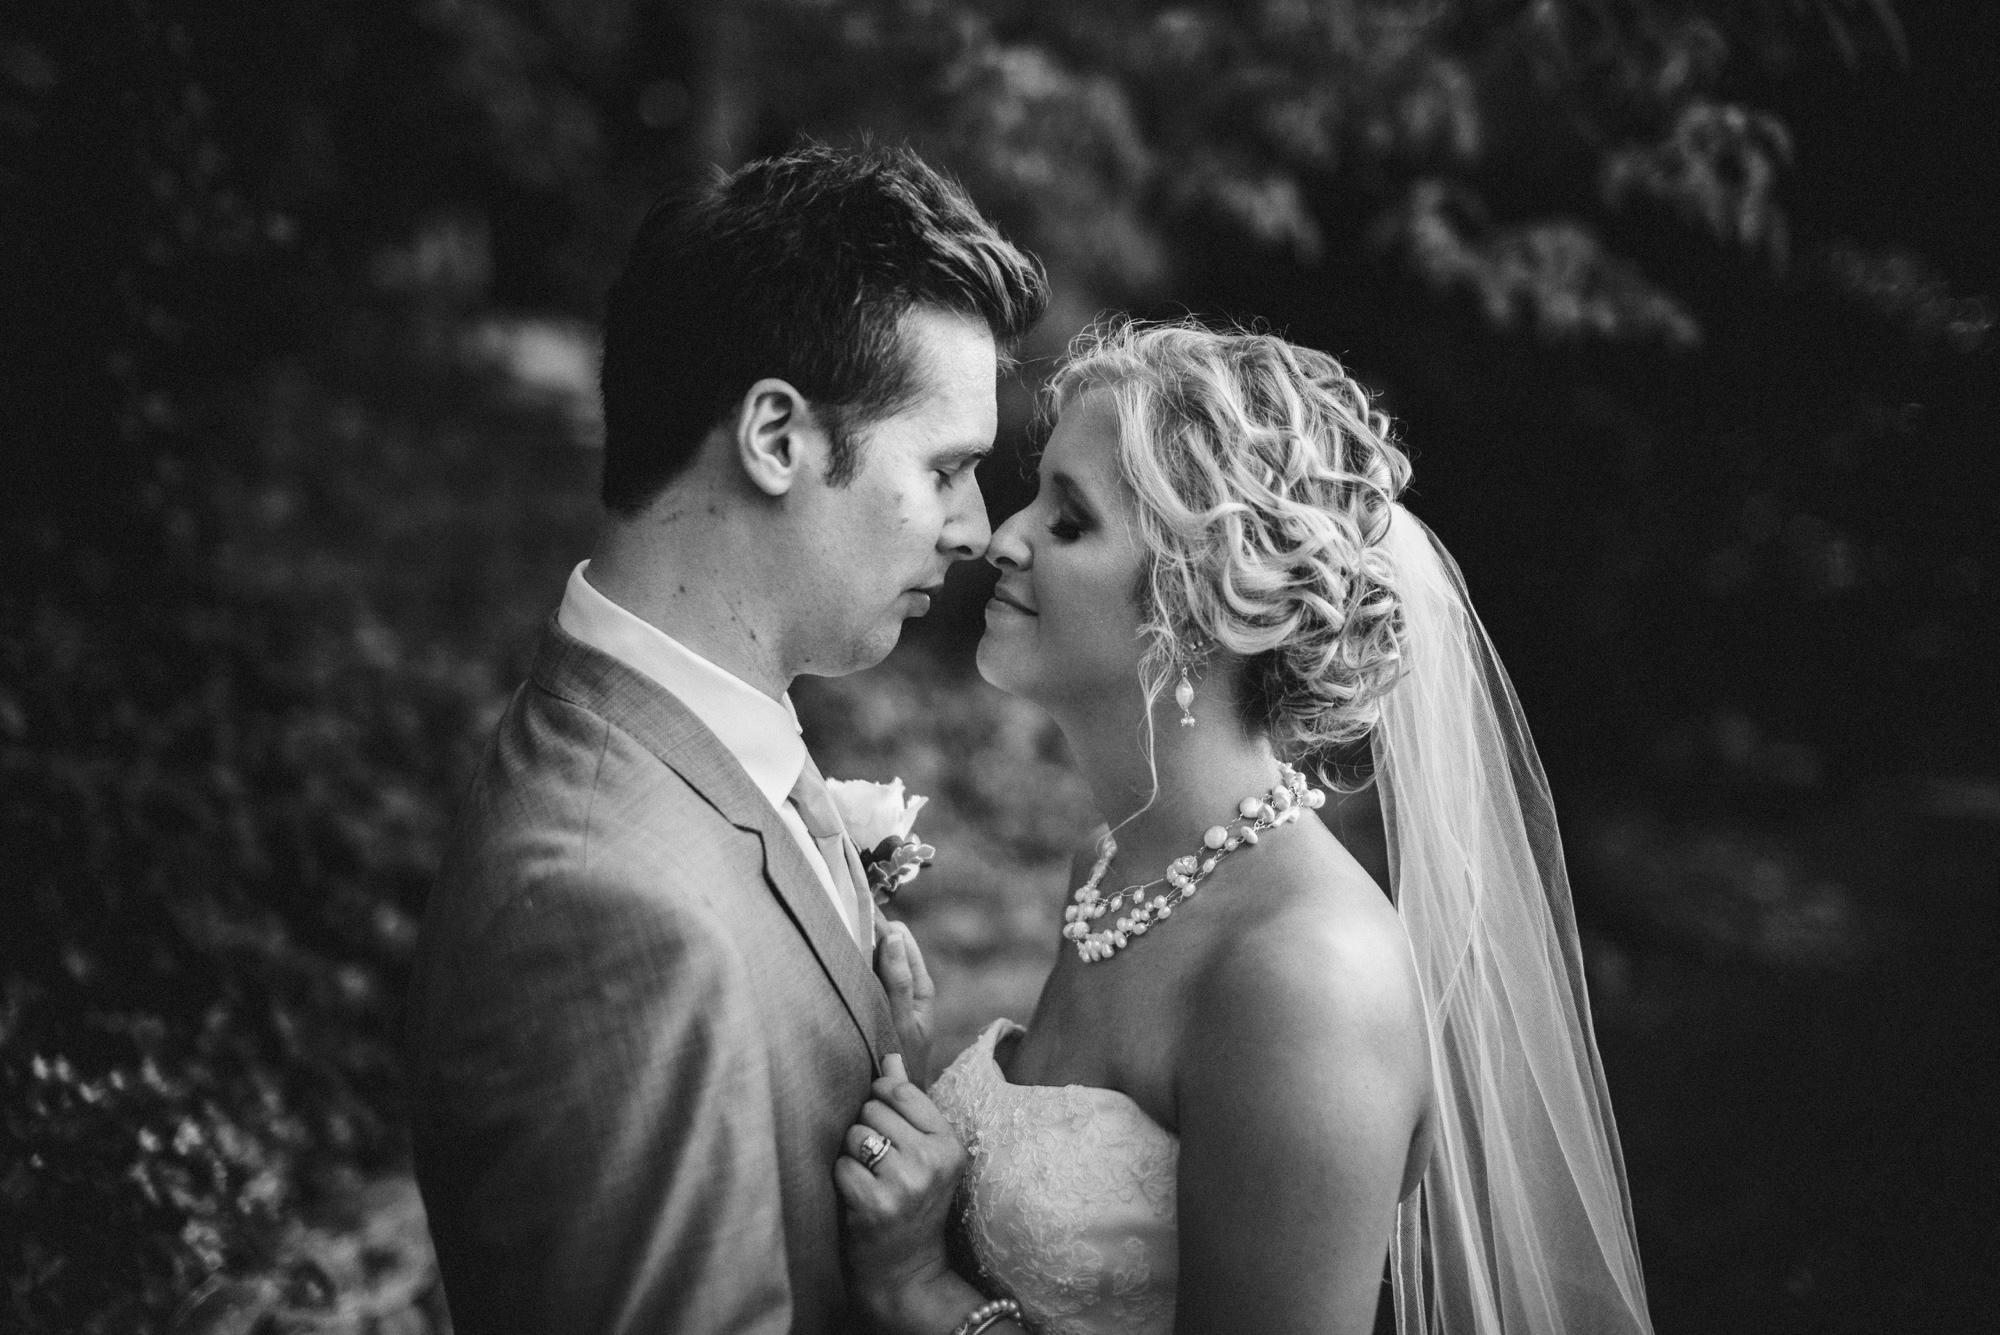 wedding-photography-virginia_0036.jpg